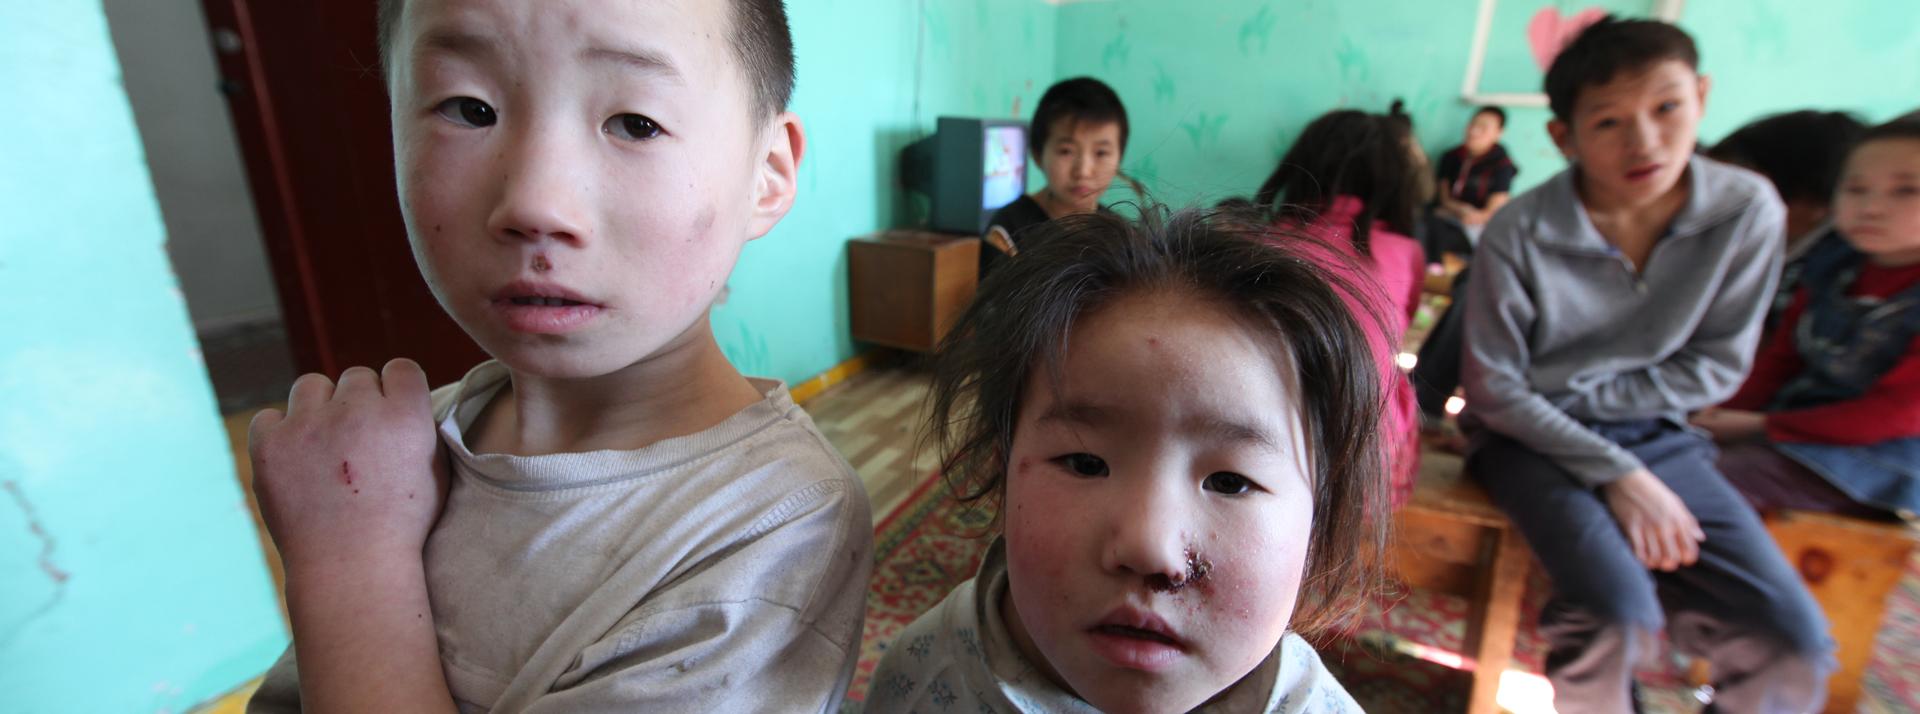 Strassenkinder in Ulaanbaatar